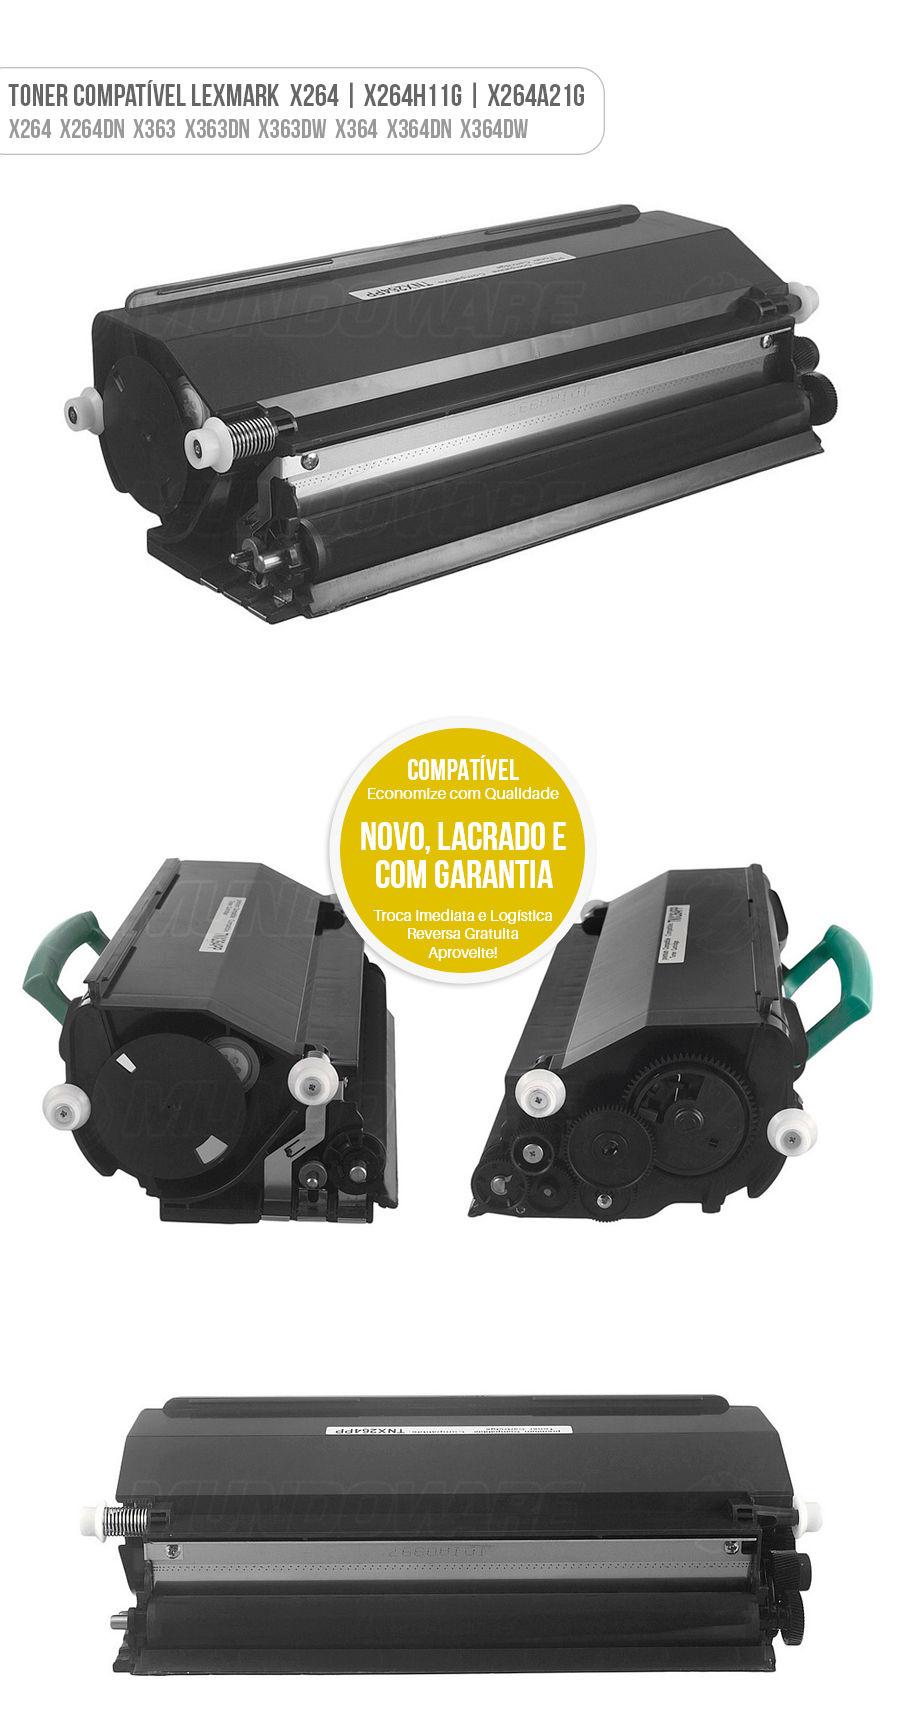 Lexmark Toner X264 X264DN X363 X363DN X363DW X364 X364DN X364DW 264DN 363DN 363DW 364DN 364DW Tonner